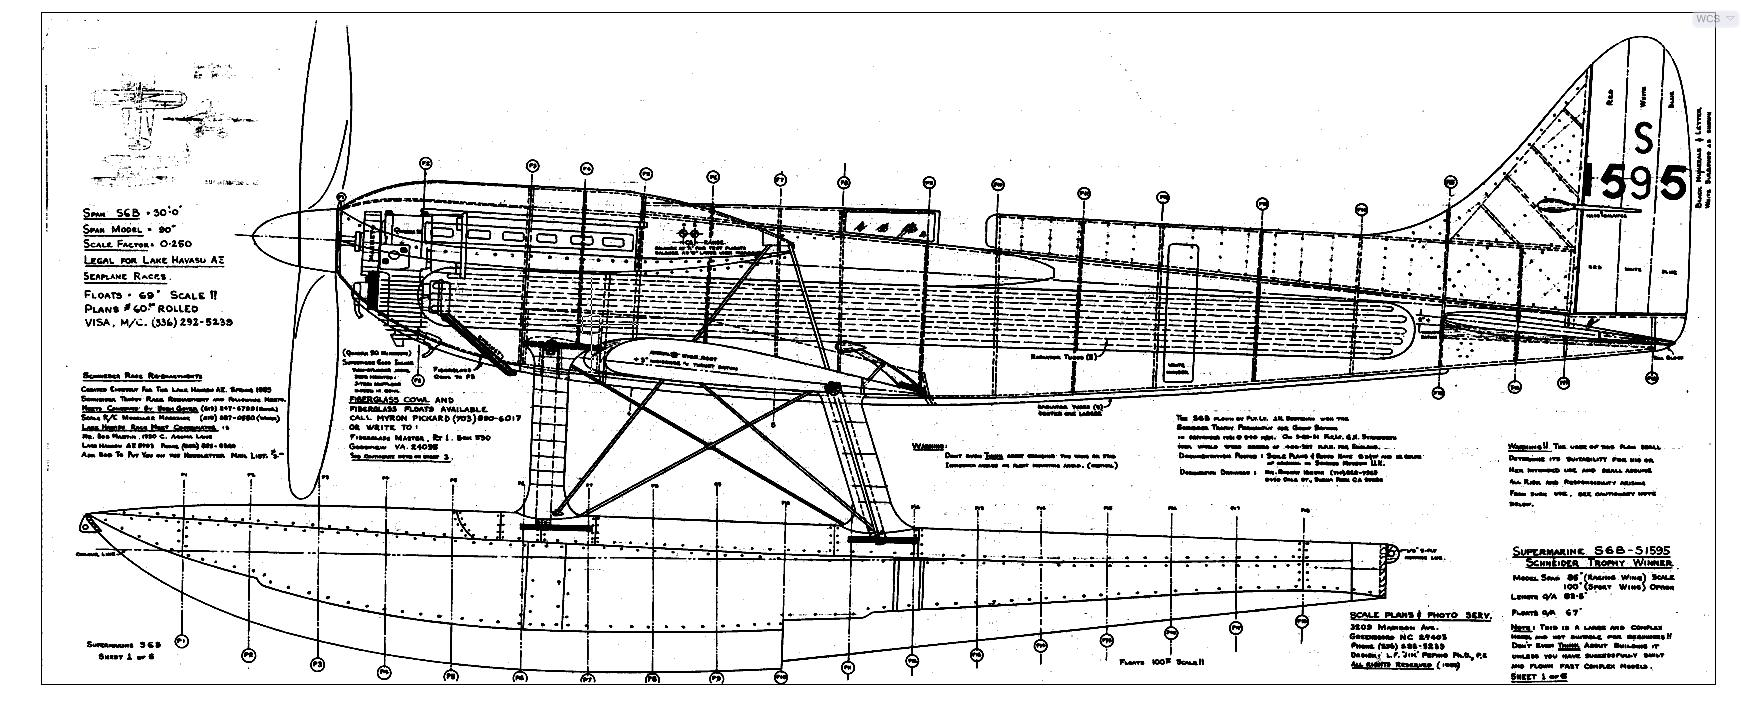 1 5 Scale Supermarine S 6b Laser Design Services